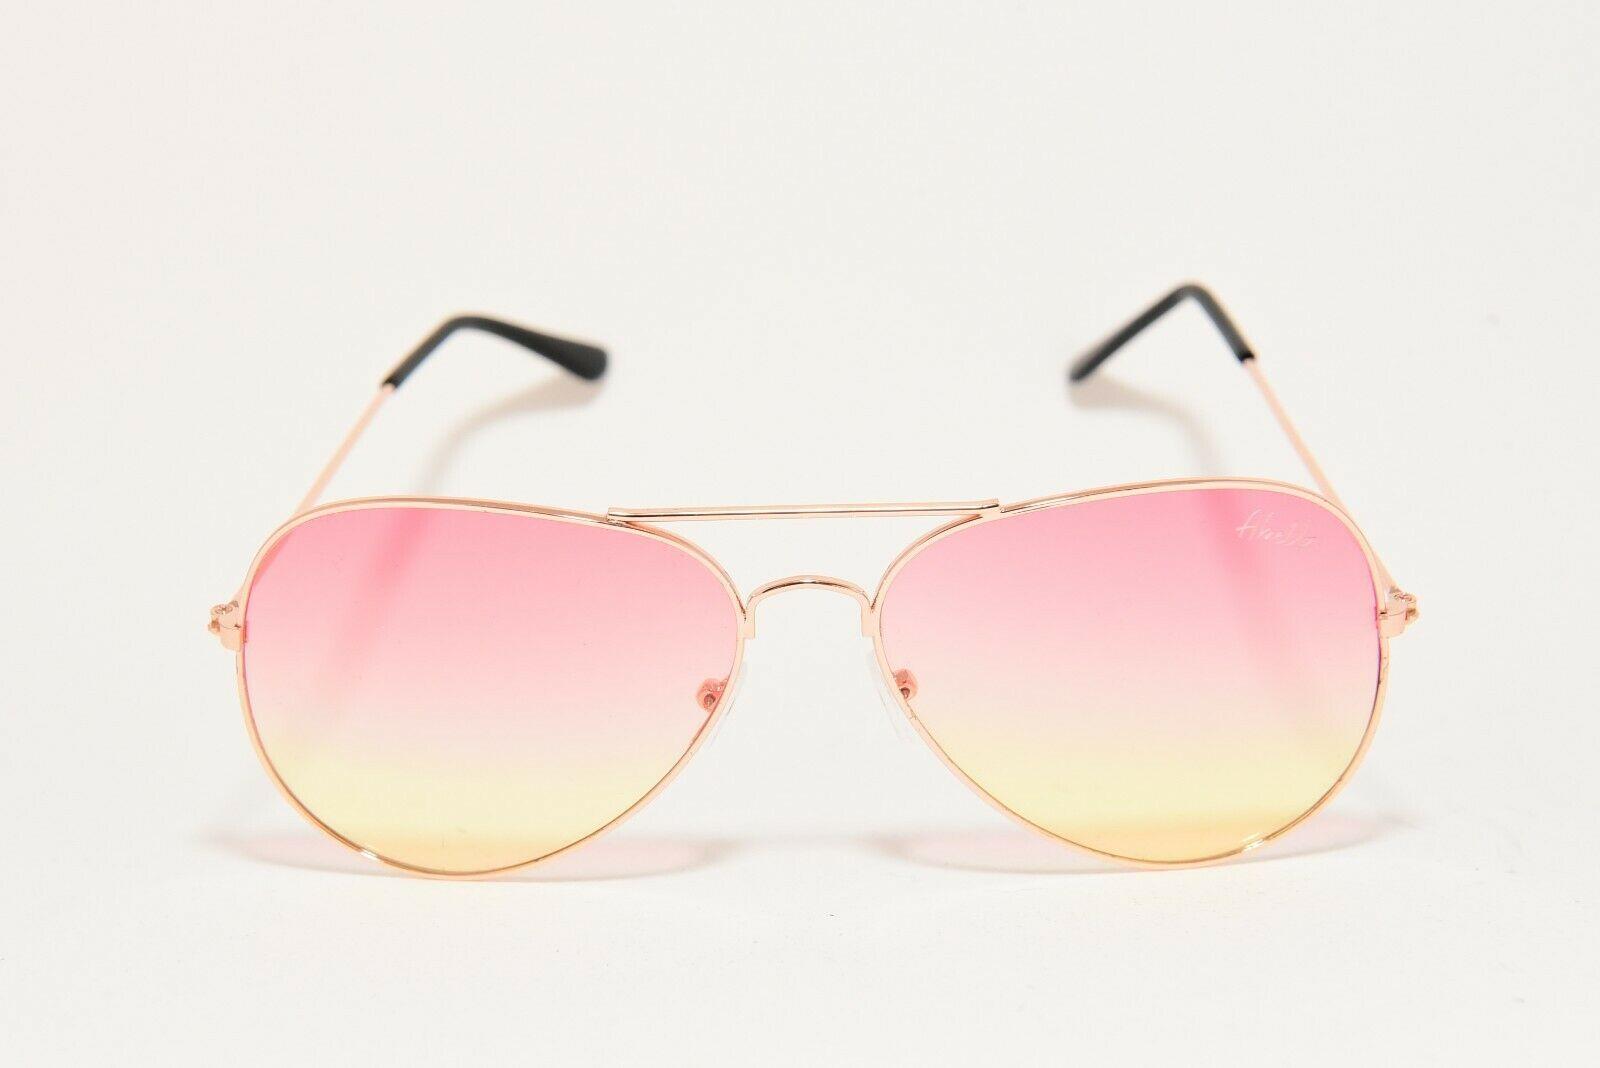 Abella Gold Aviator Sunglasses 805541 C6 And 50 Similar Items